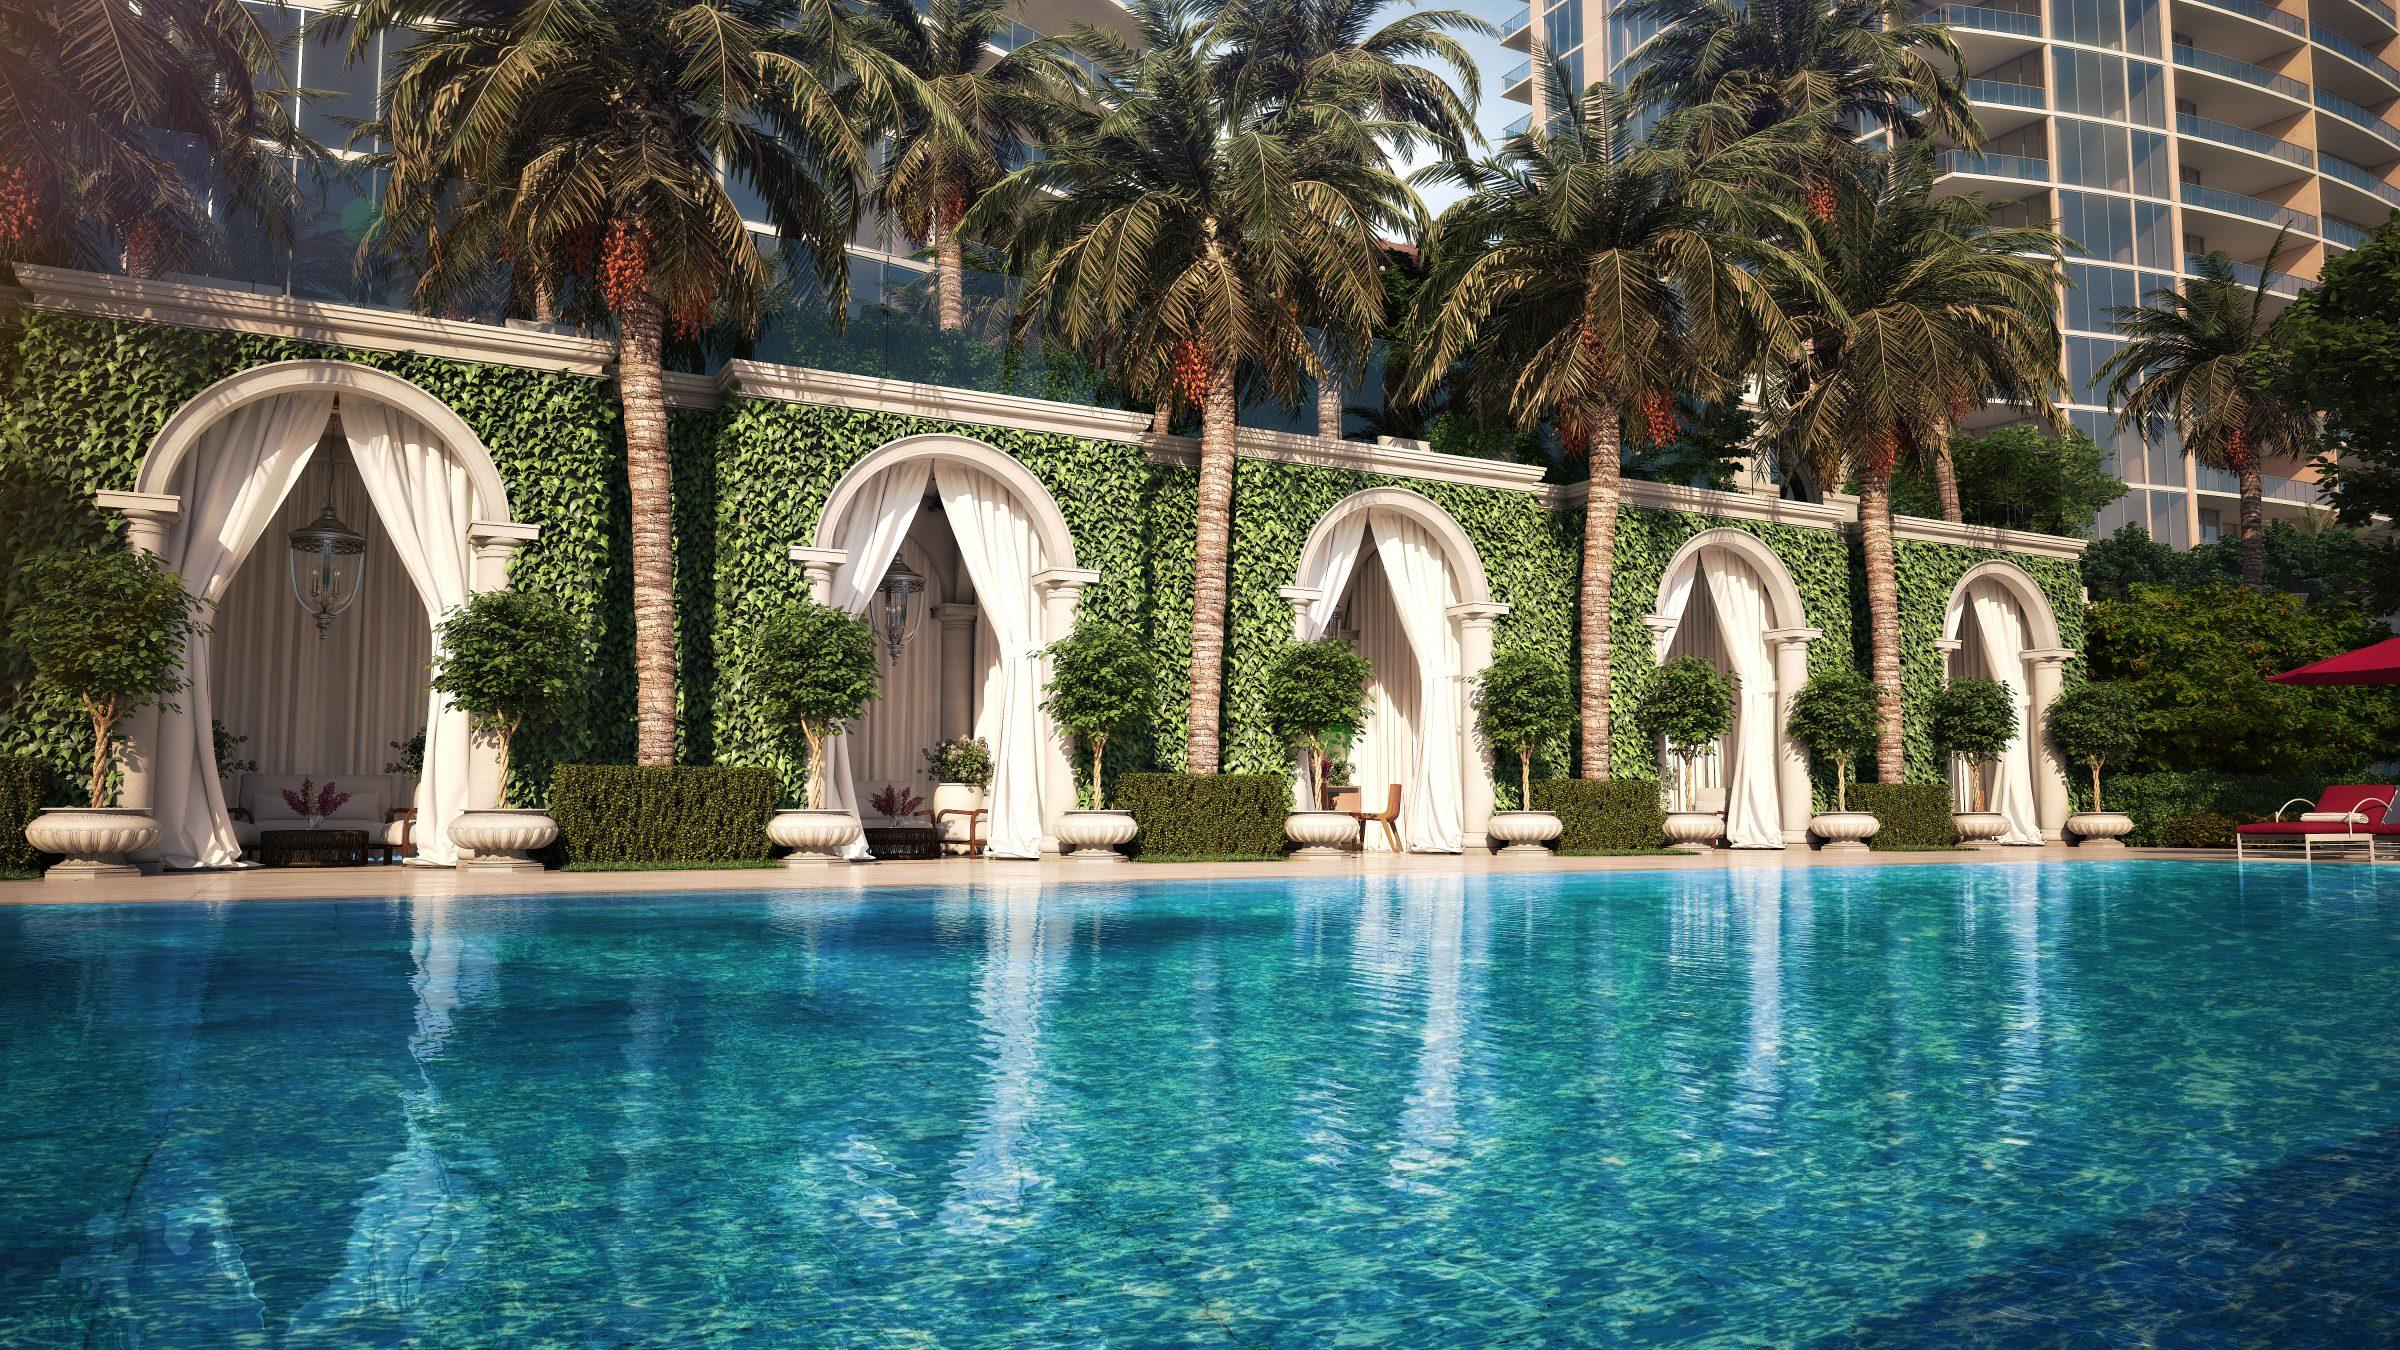 Pools-and-Cabanas-2400x1350.jpg